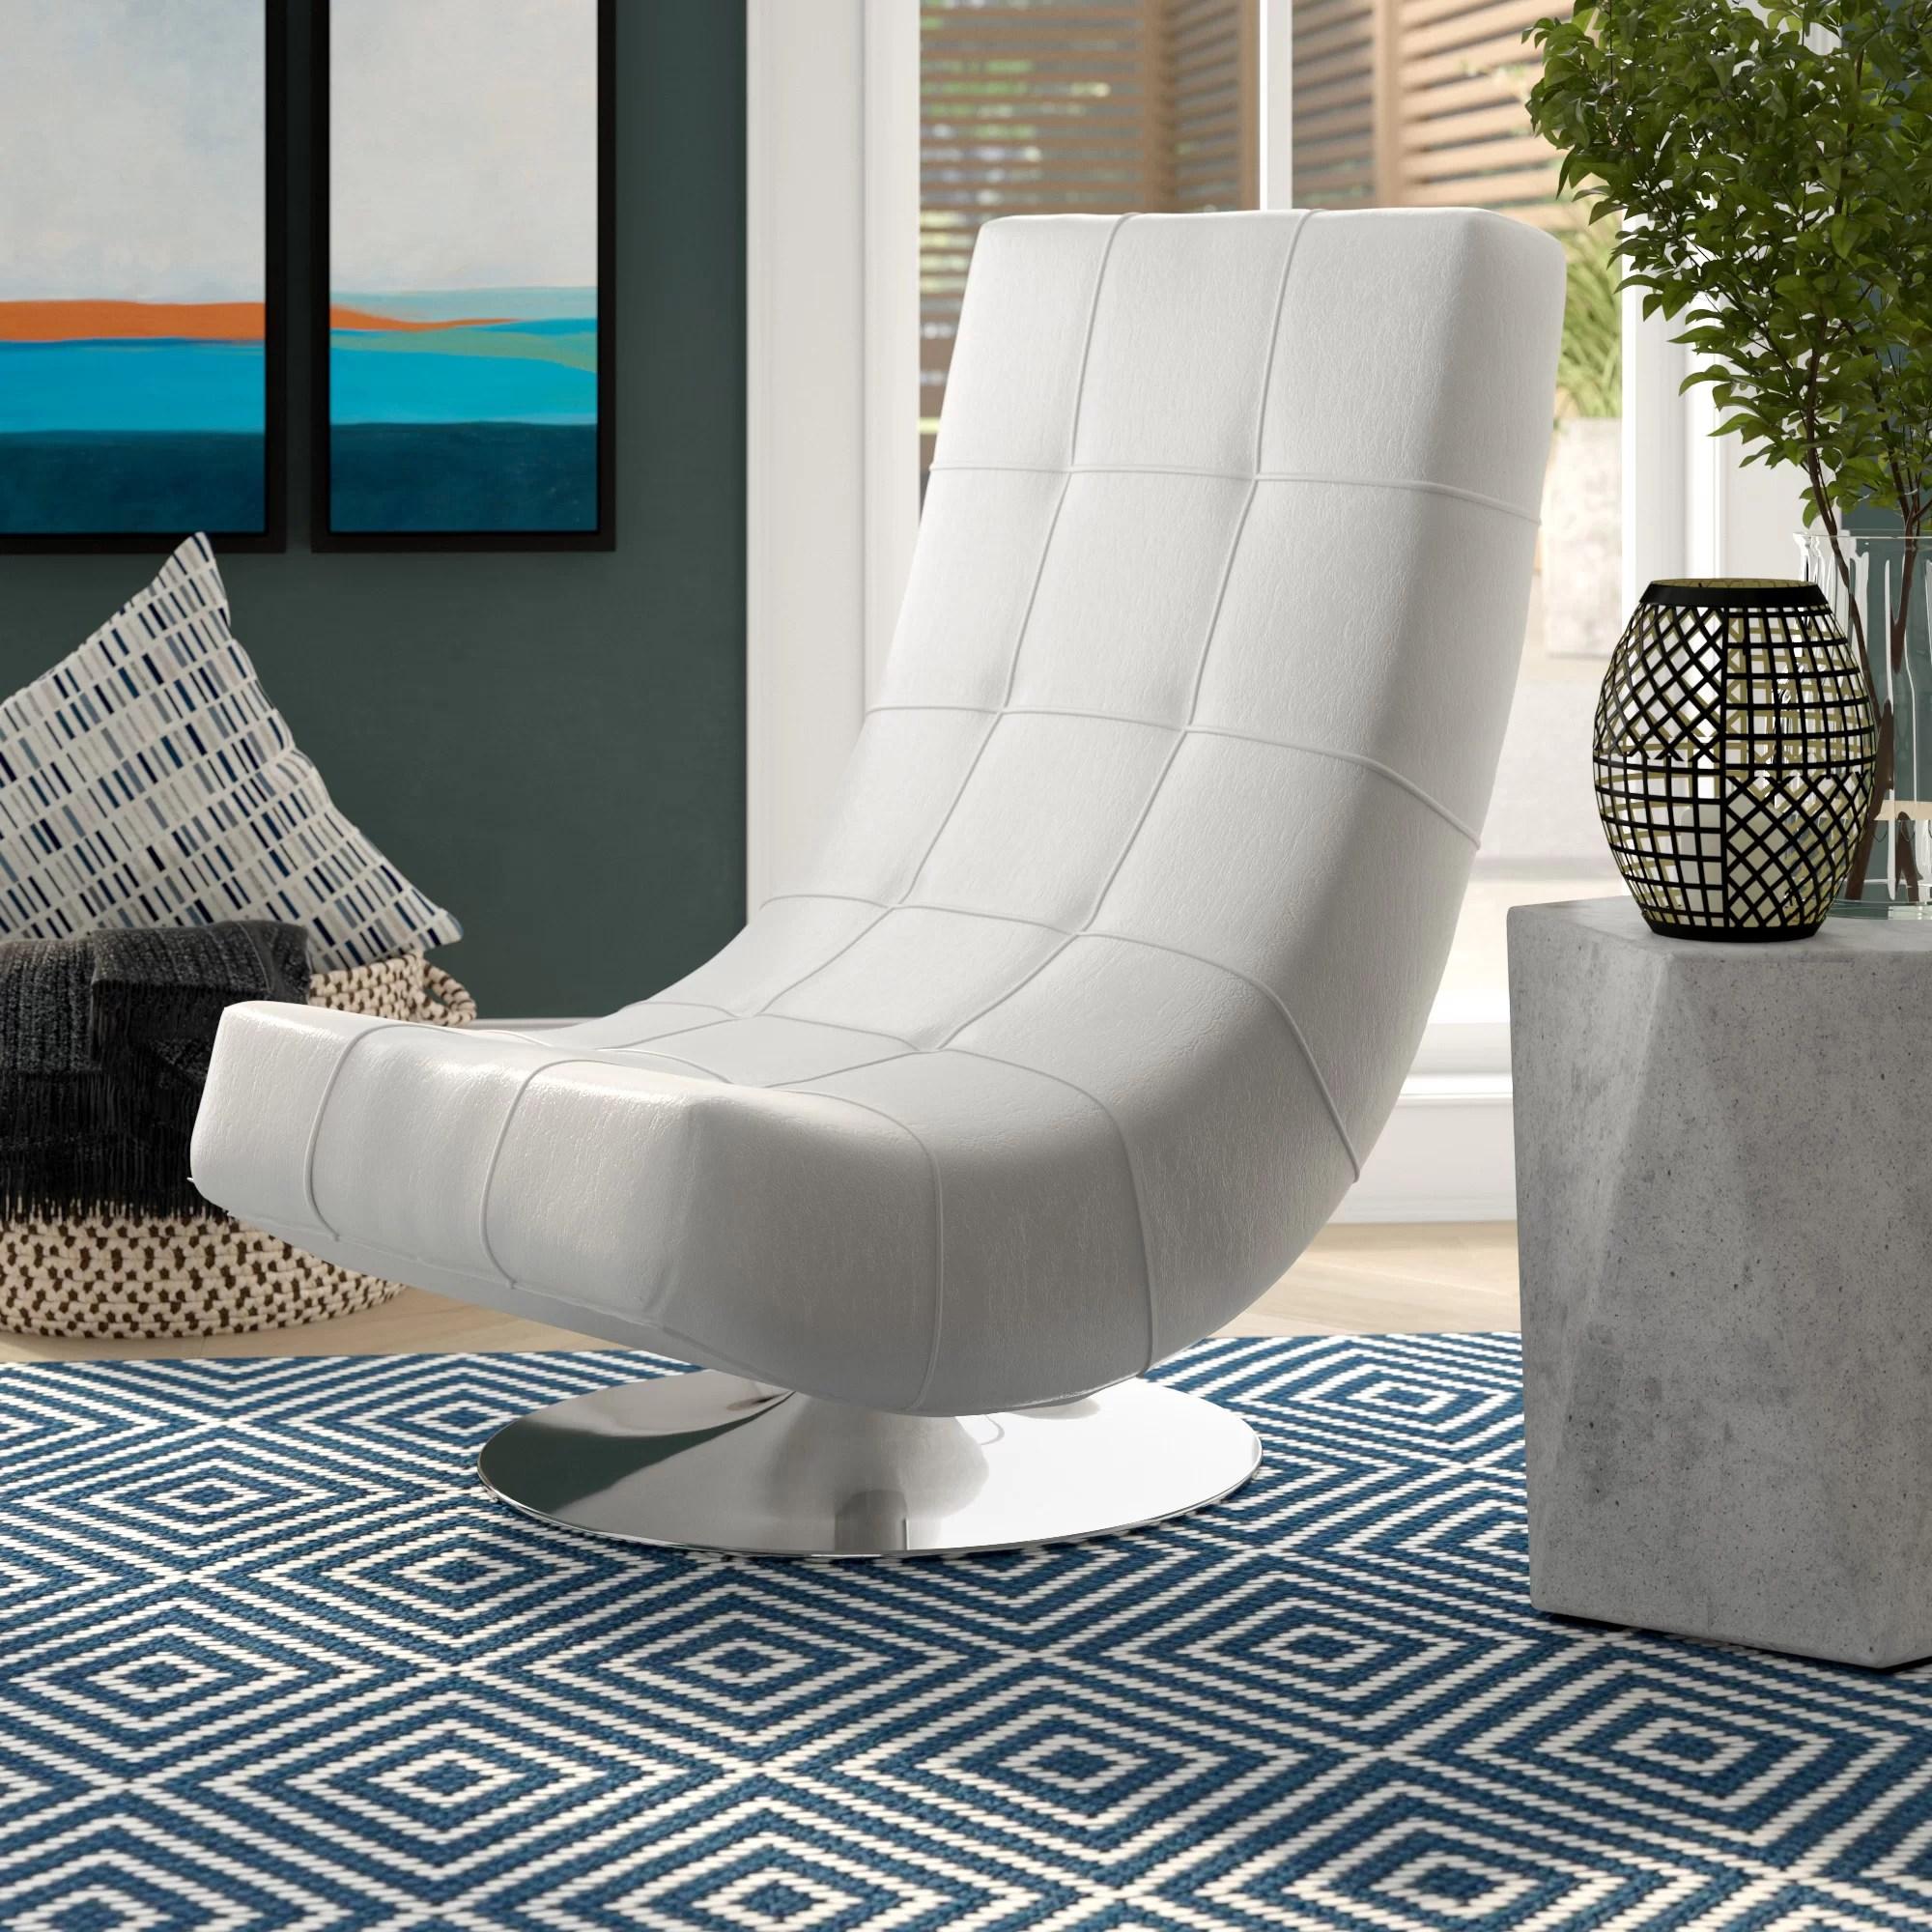 swivel cuddle chair york cesca replacement seats orren ellis ober lounge reviews wayfair